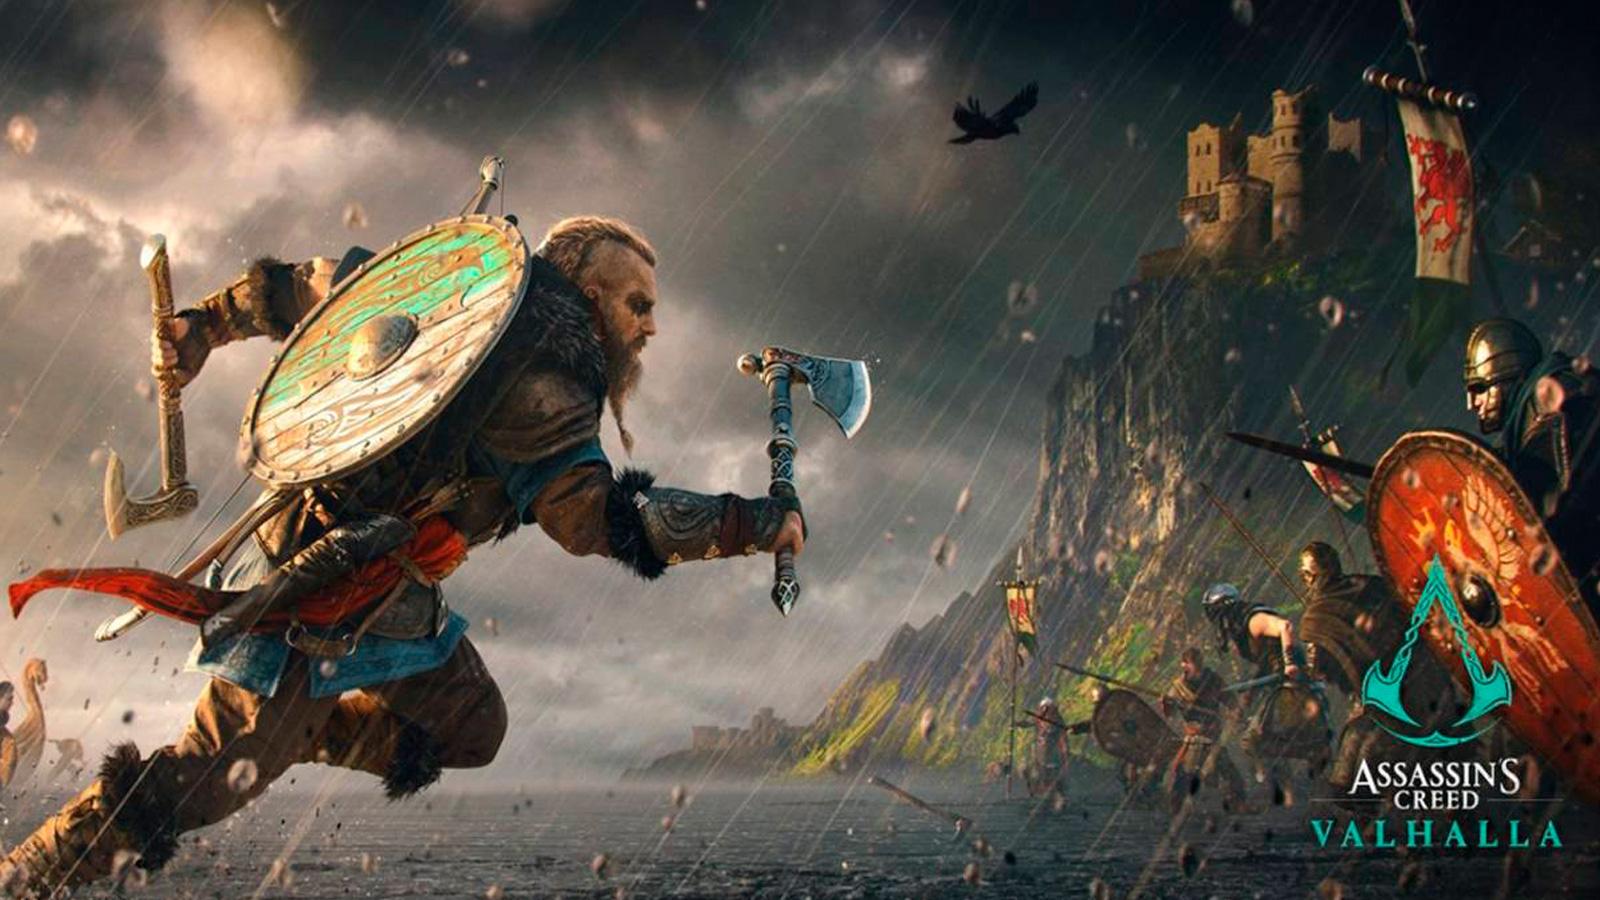 Eivor en Assassin's Creed Valhalla